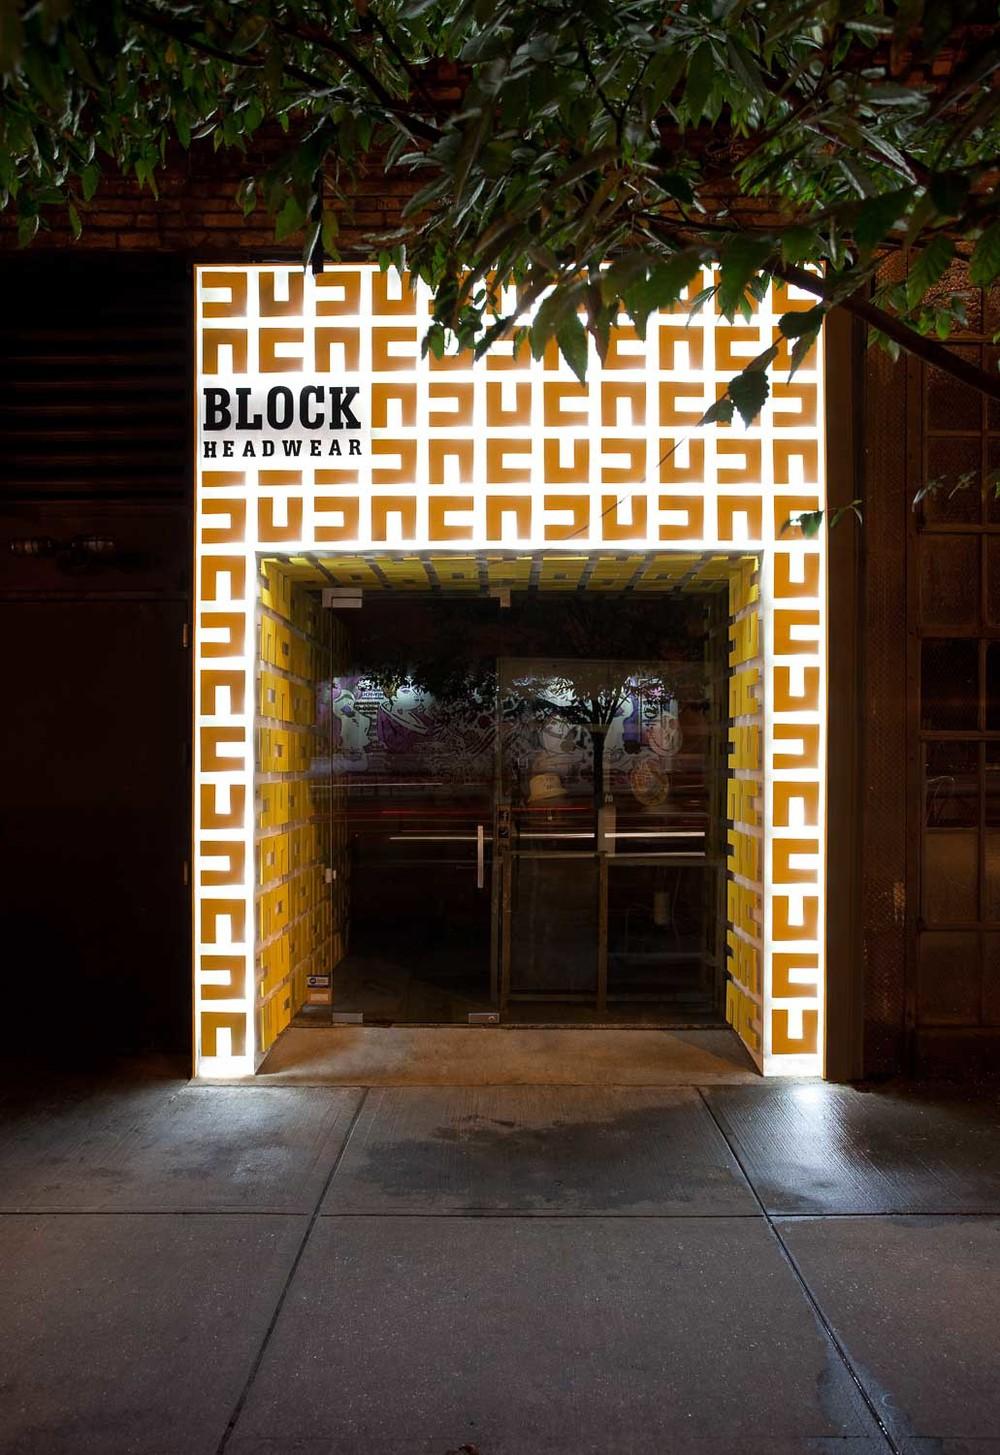 Block Headwear Storefront